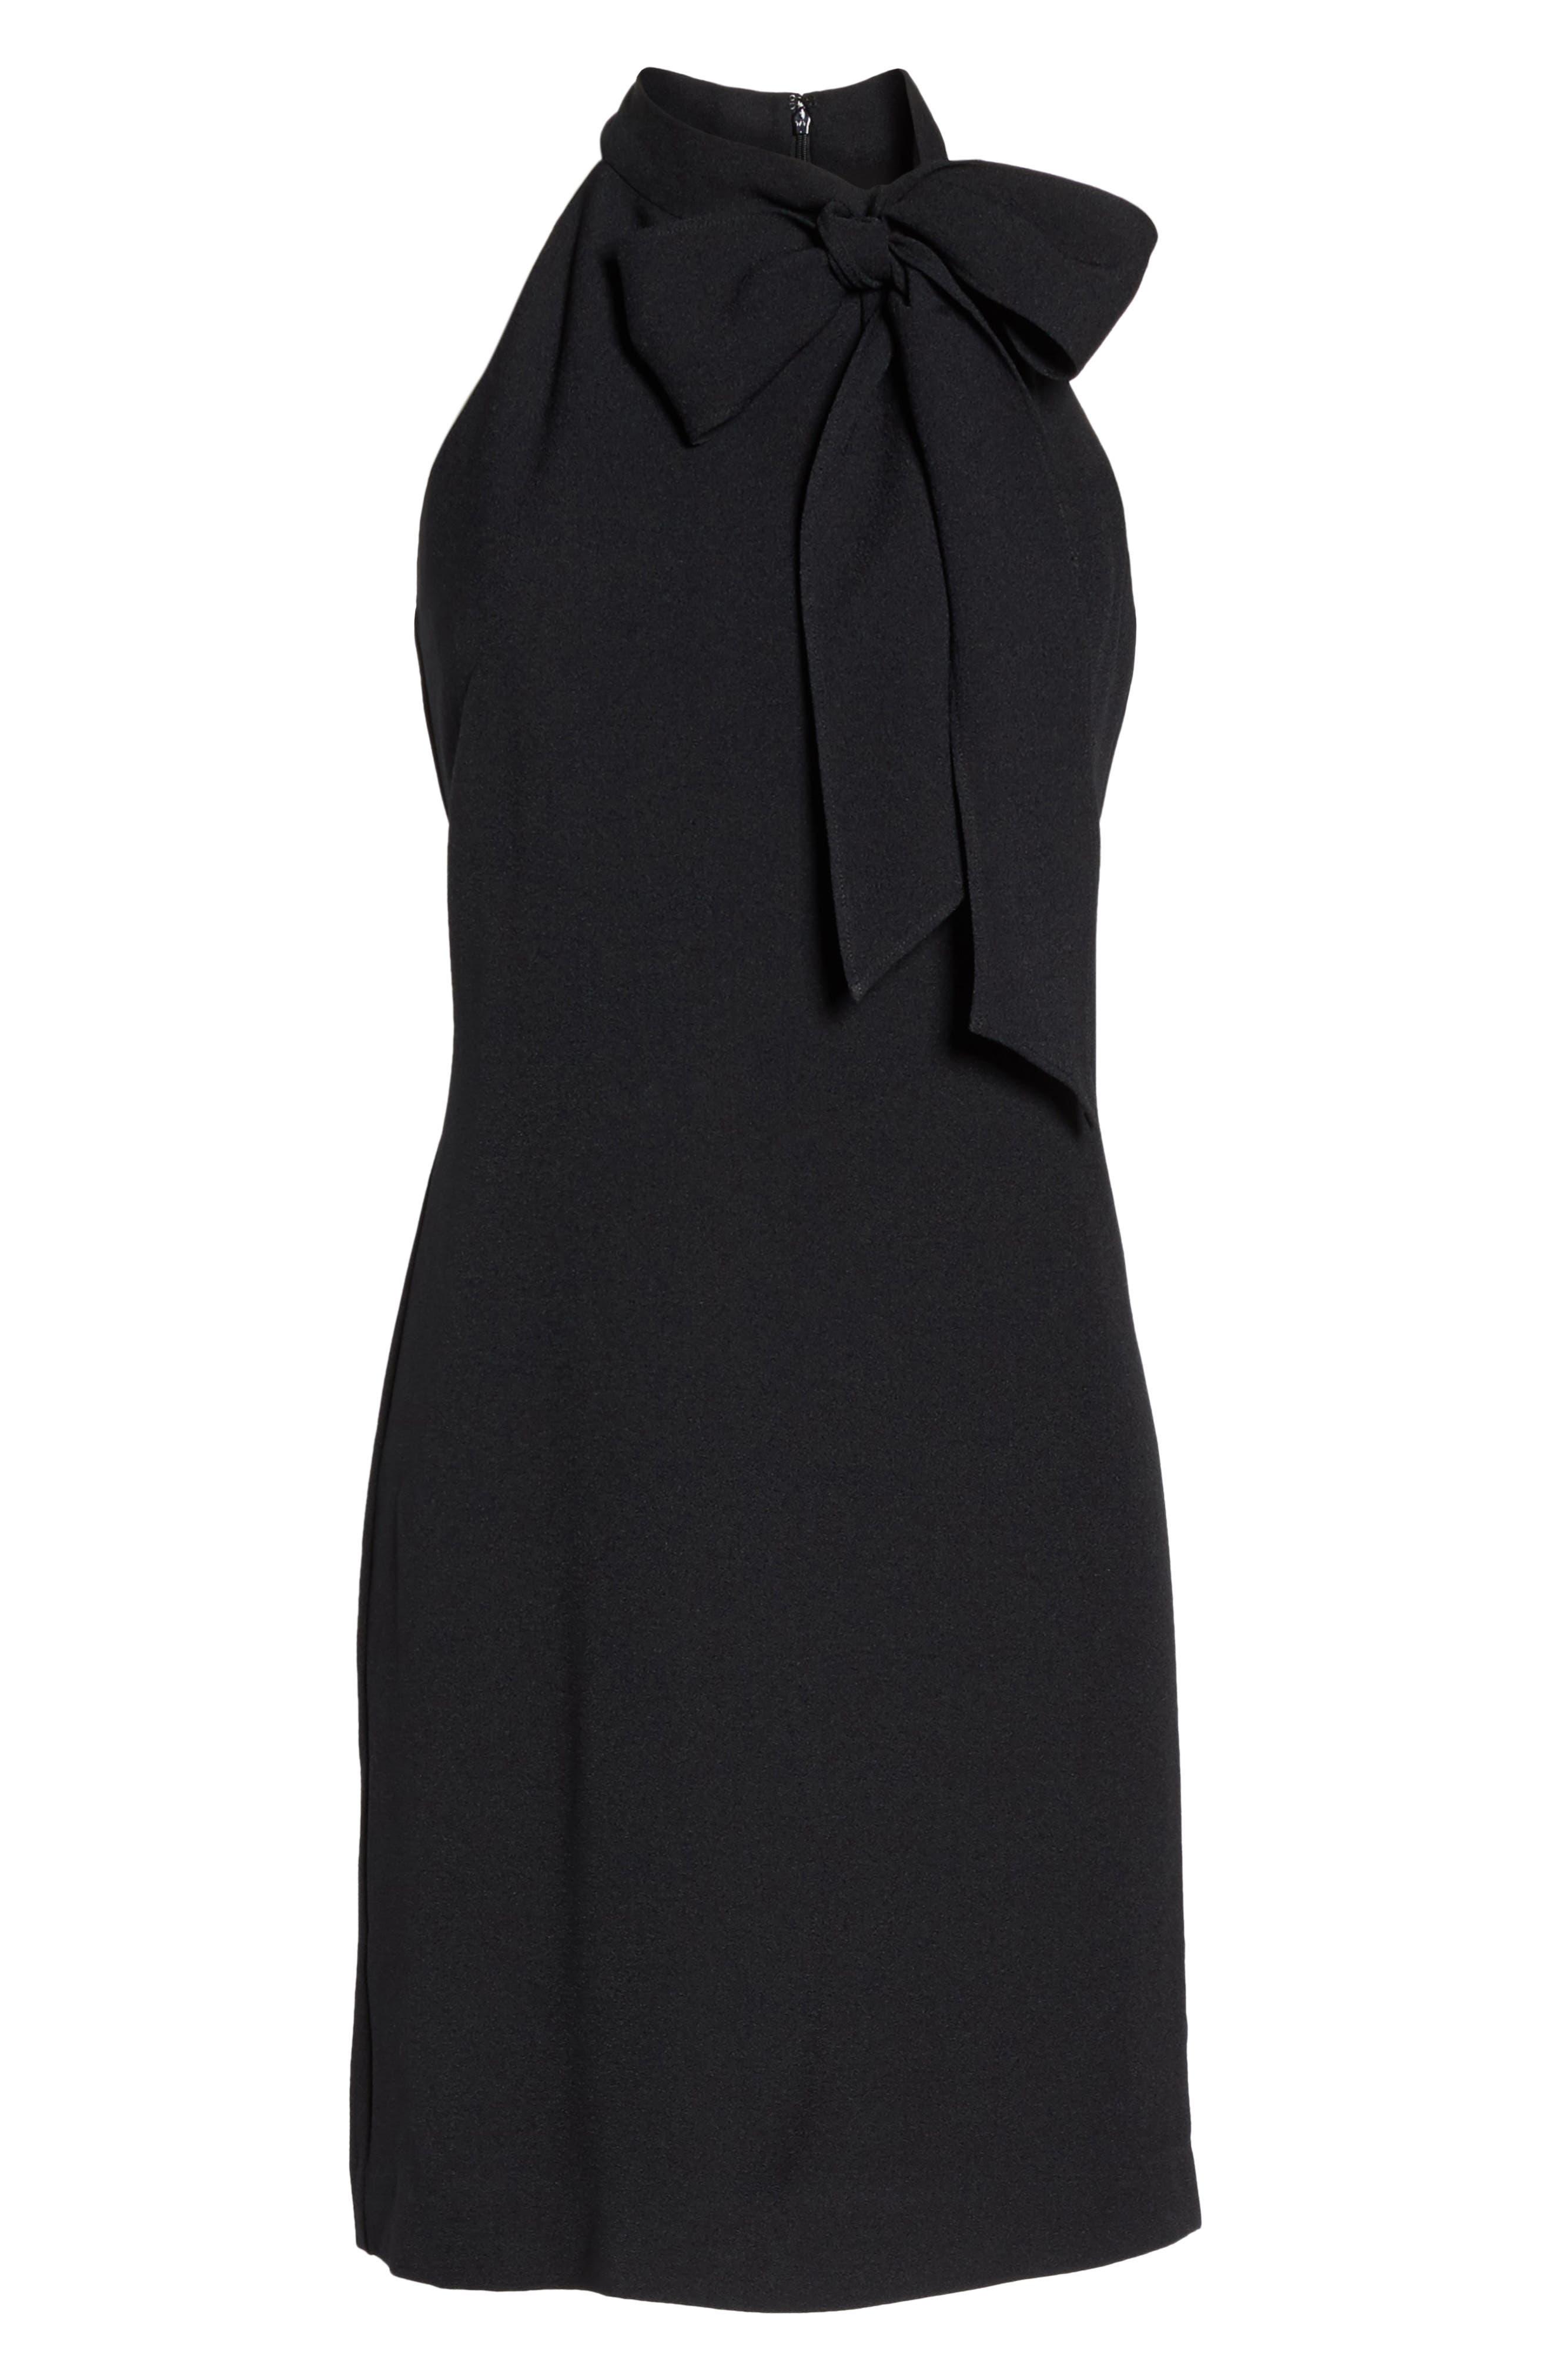 A-Line Dress,                             Alternate thumbnail 8, color,                             BLACK